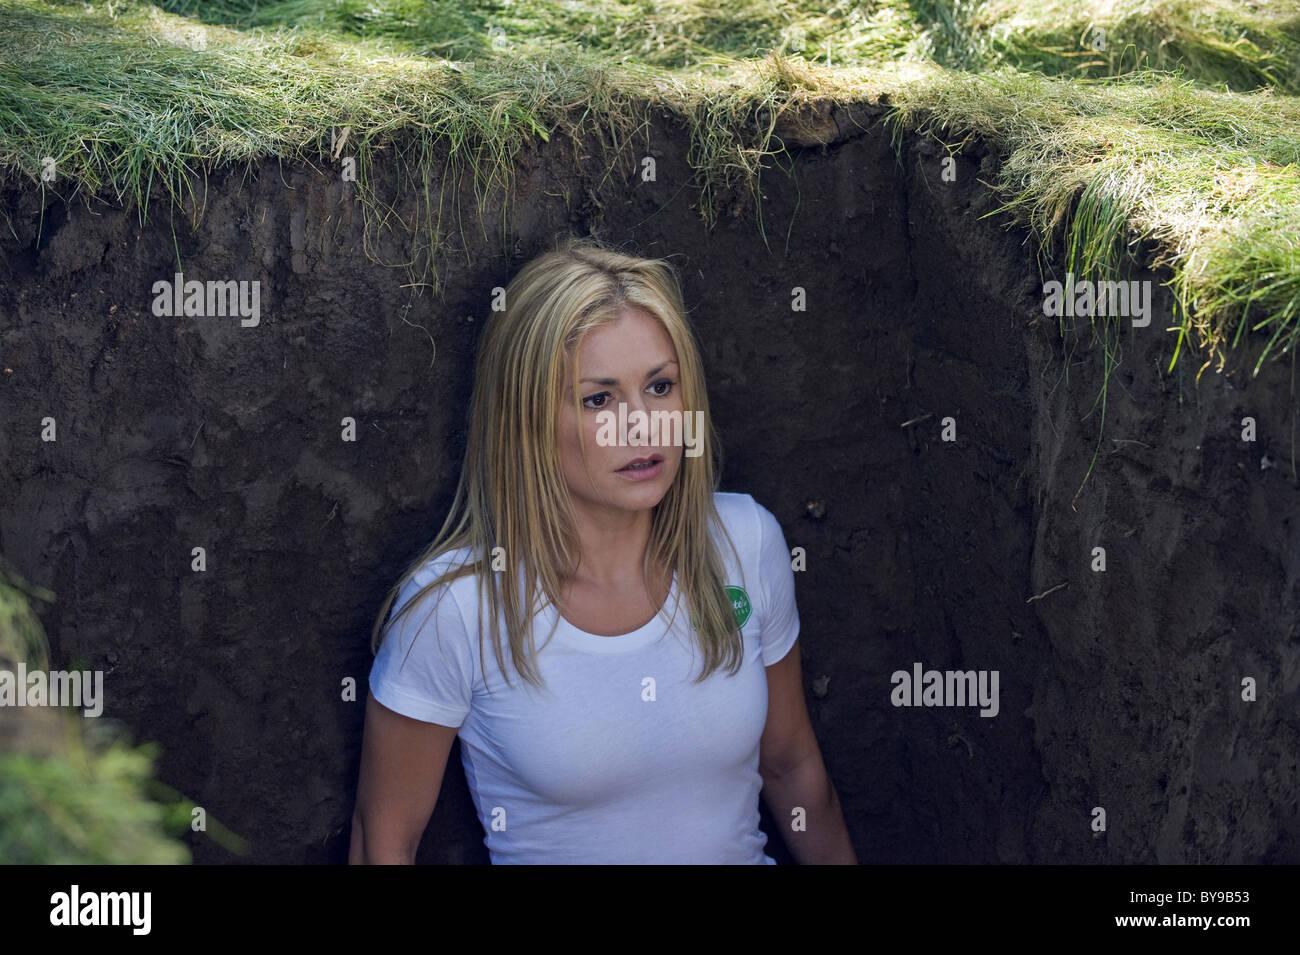 Blood True TV-Serie 2008 -??? USA 2008 Staffel 01 - Folge 12: Du wirst mein Tod sein Regie: Alan Ball Anna Paquin Stockbild